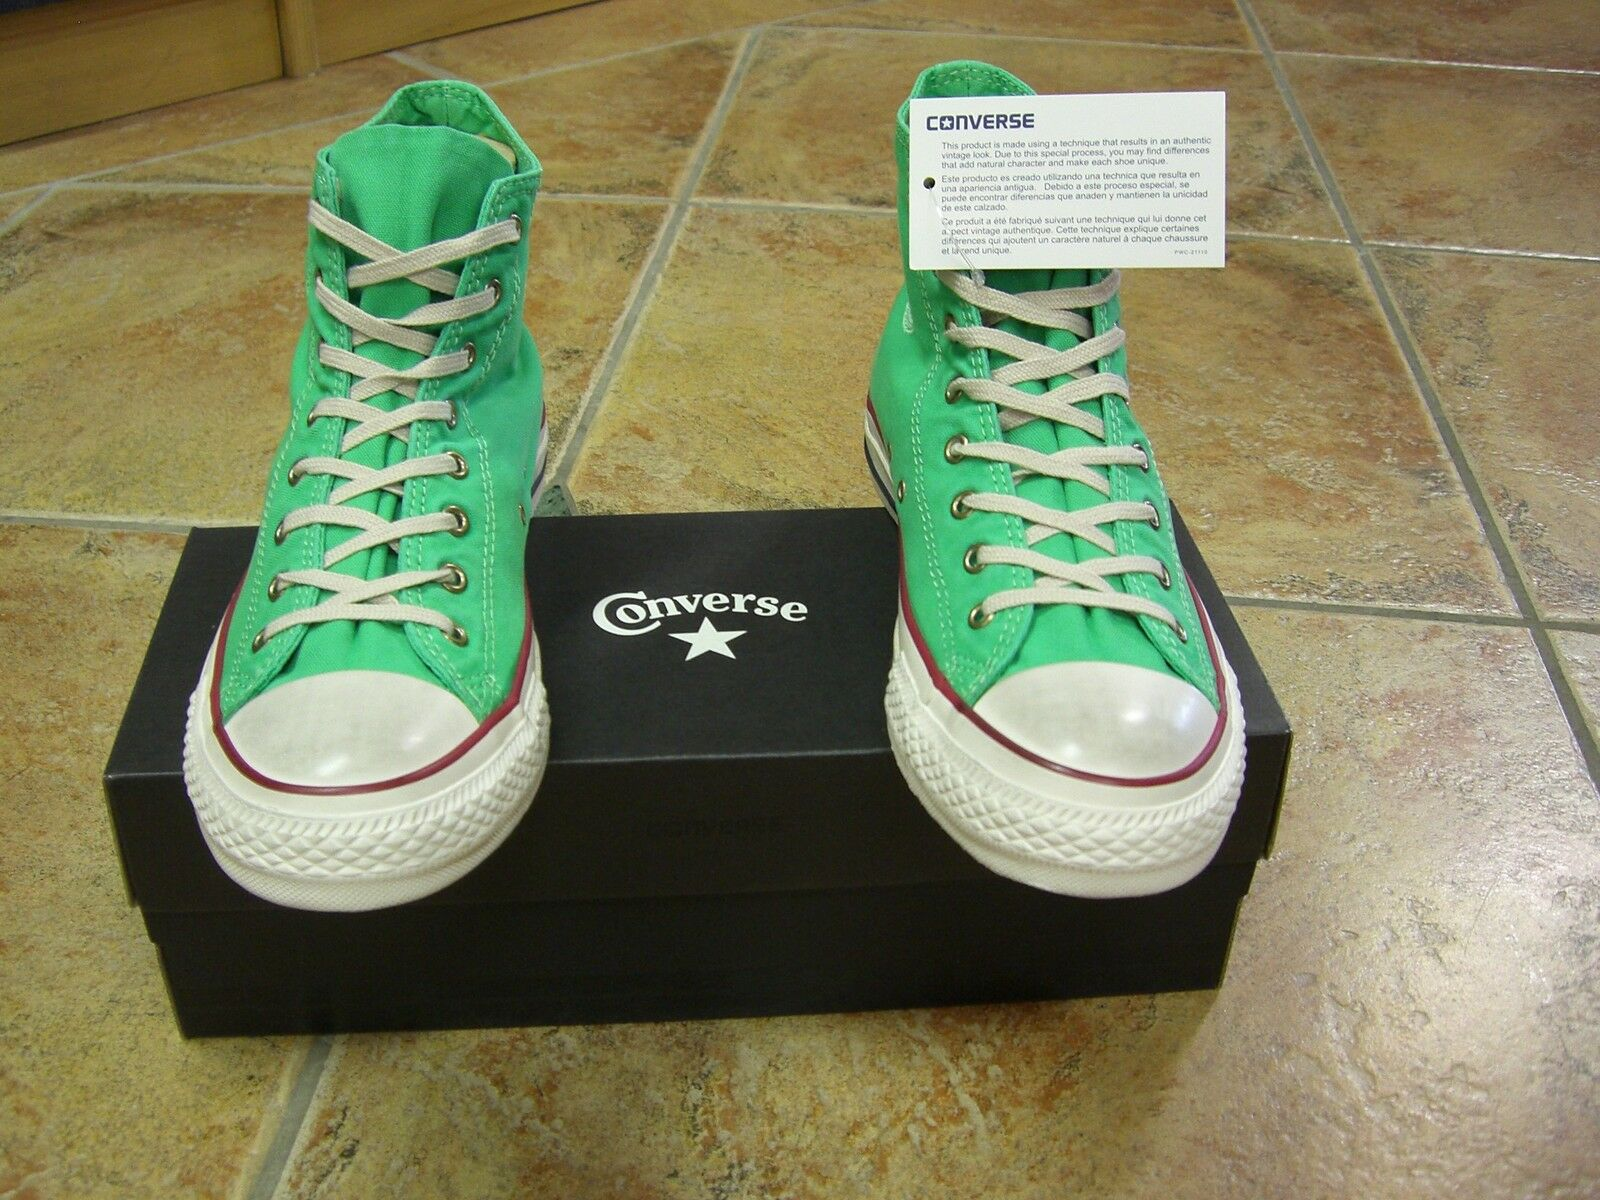 Converse Chucks All Star Gr. 36 HI DEEP MINT 136888C  NEU